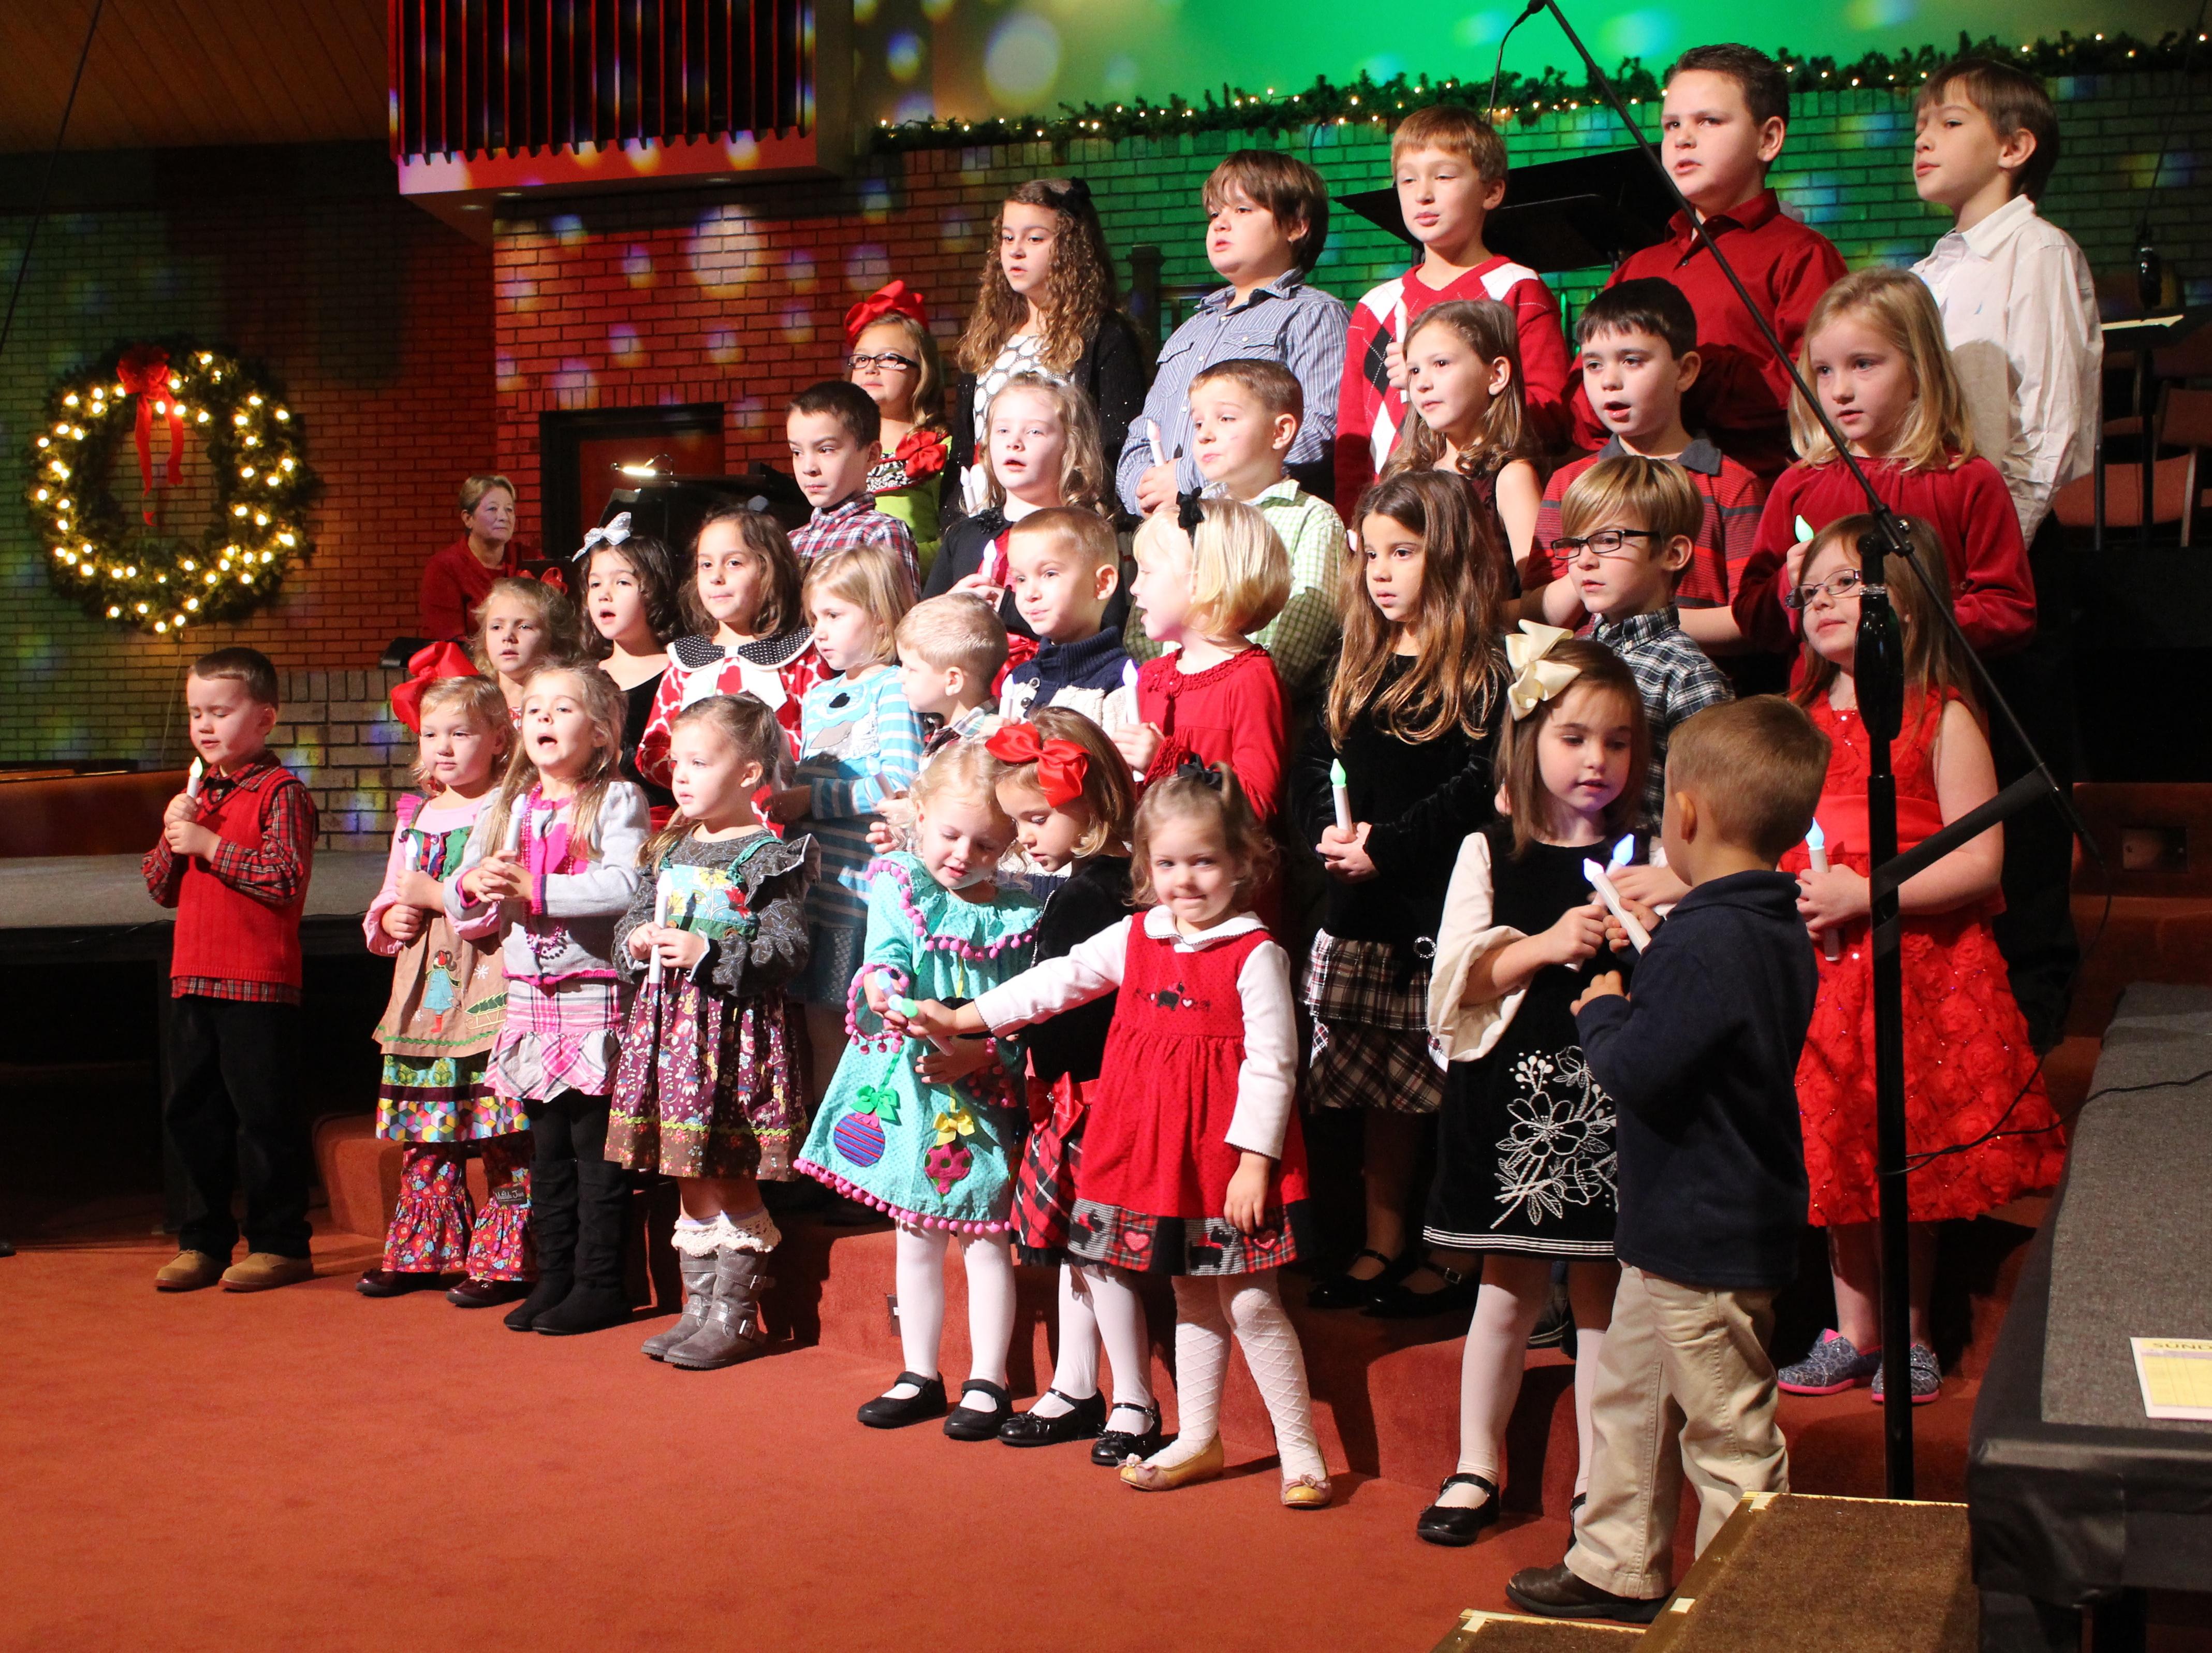 kidz choirs xmas 2014